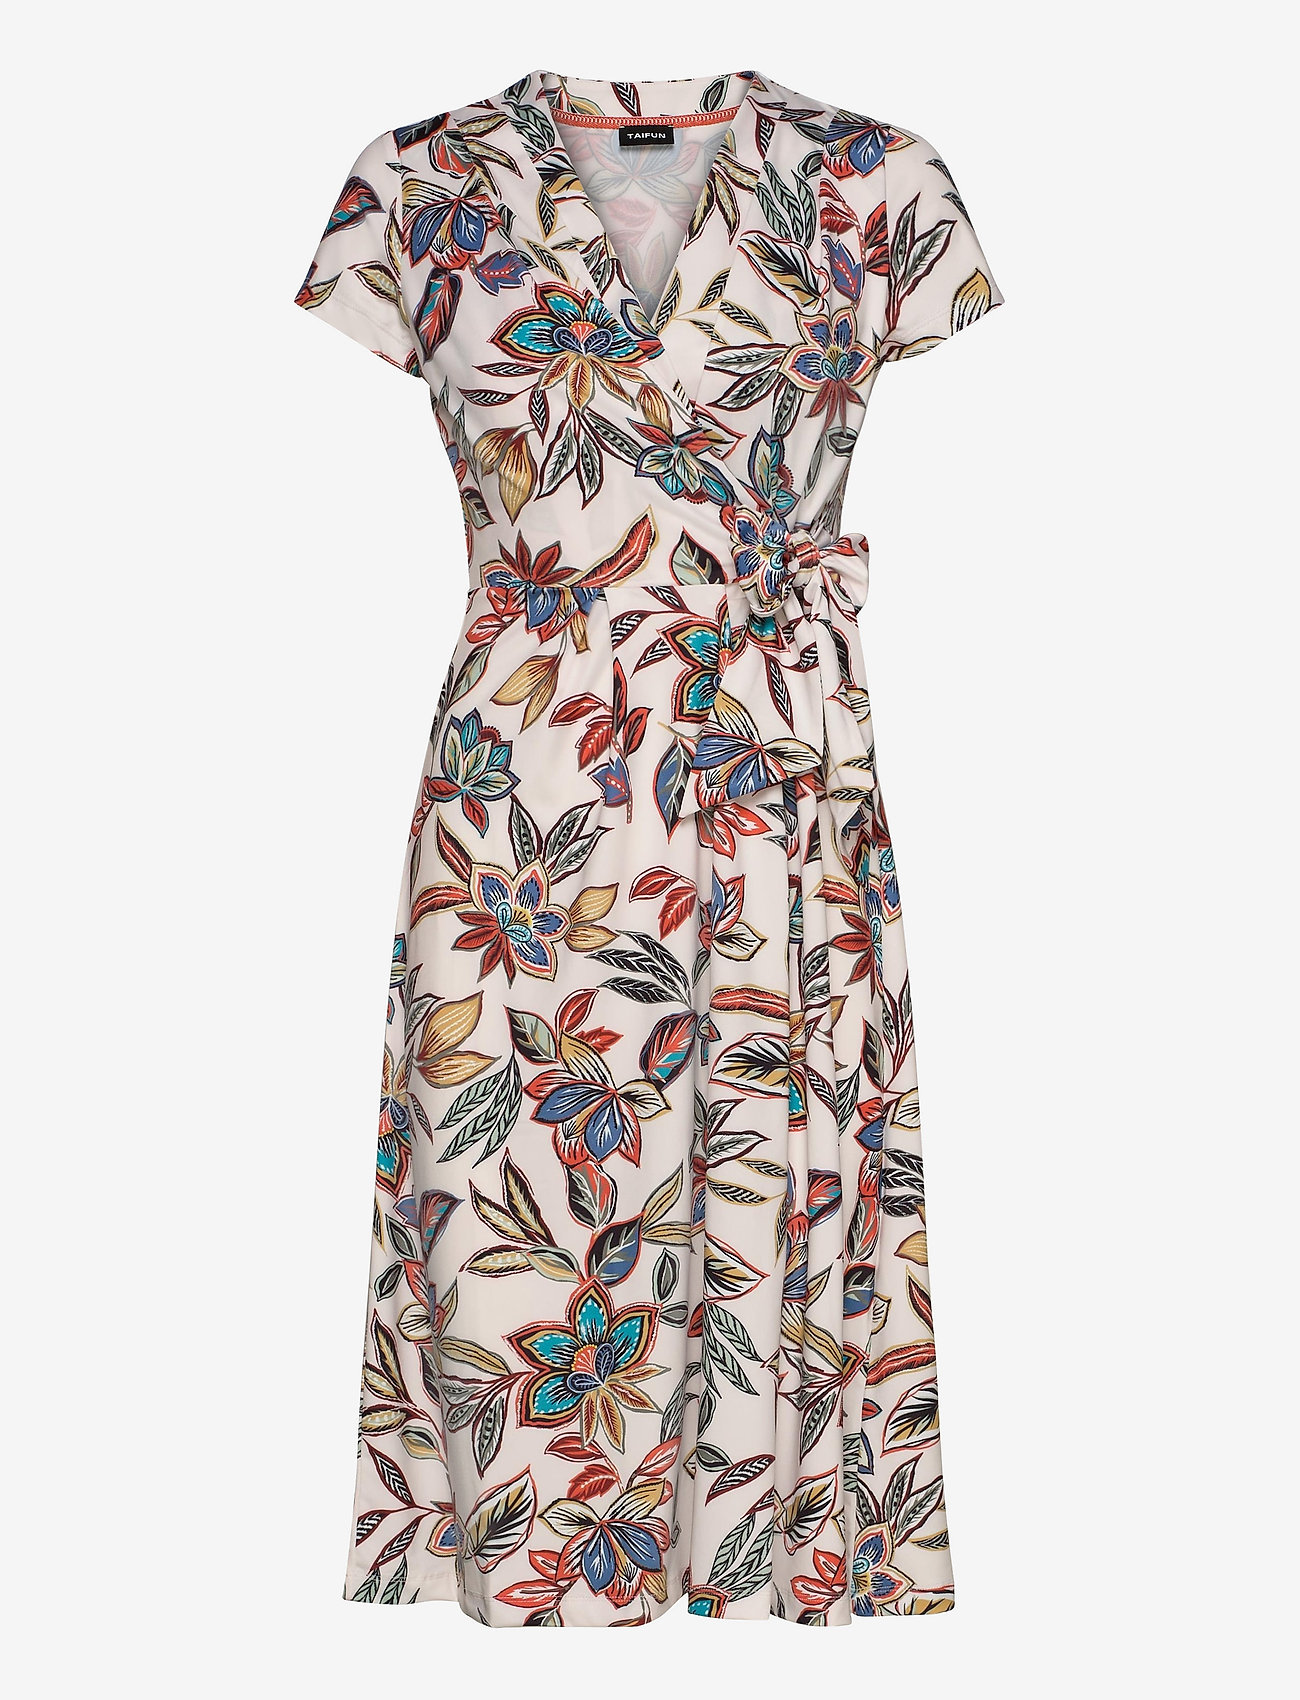 Taifun - DRESS KNITTED FABRIC - omlottklänning - linen patterned - 0